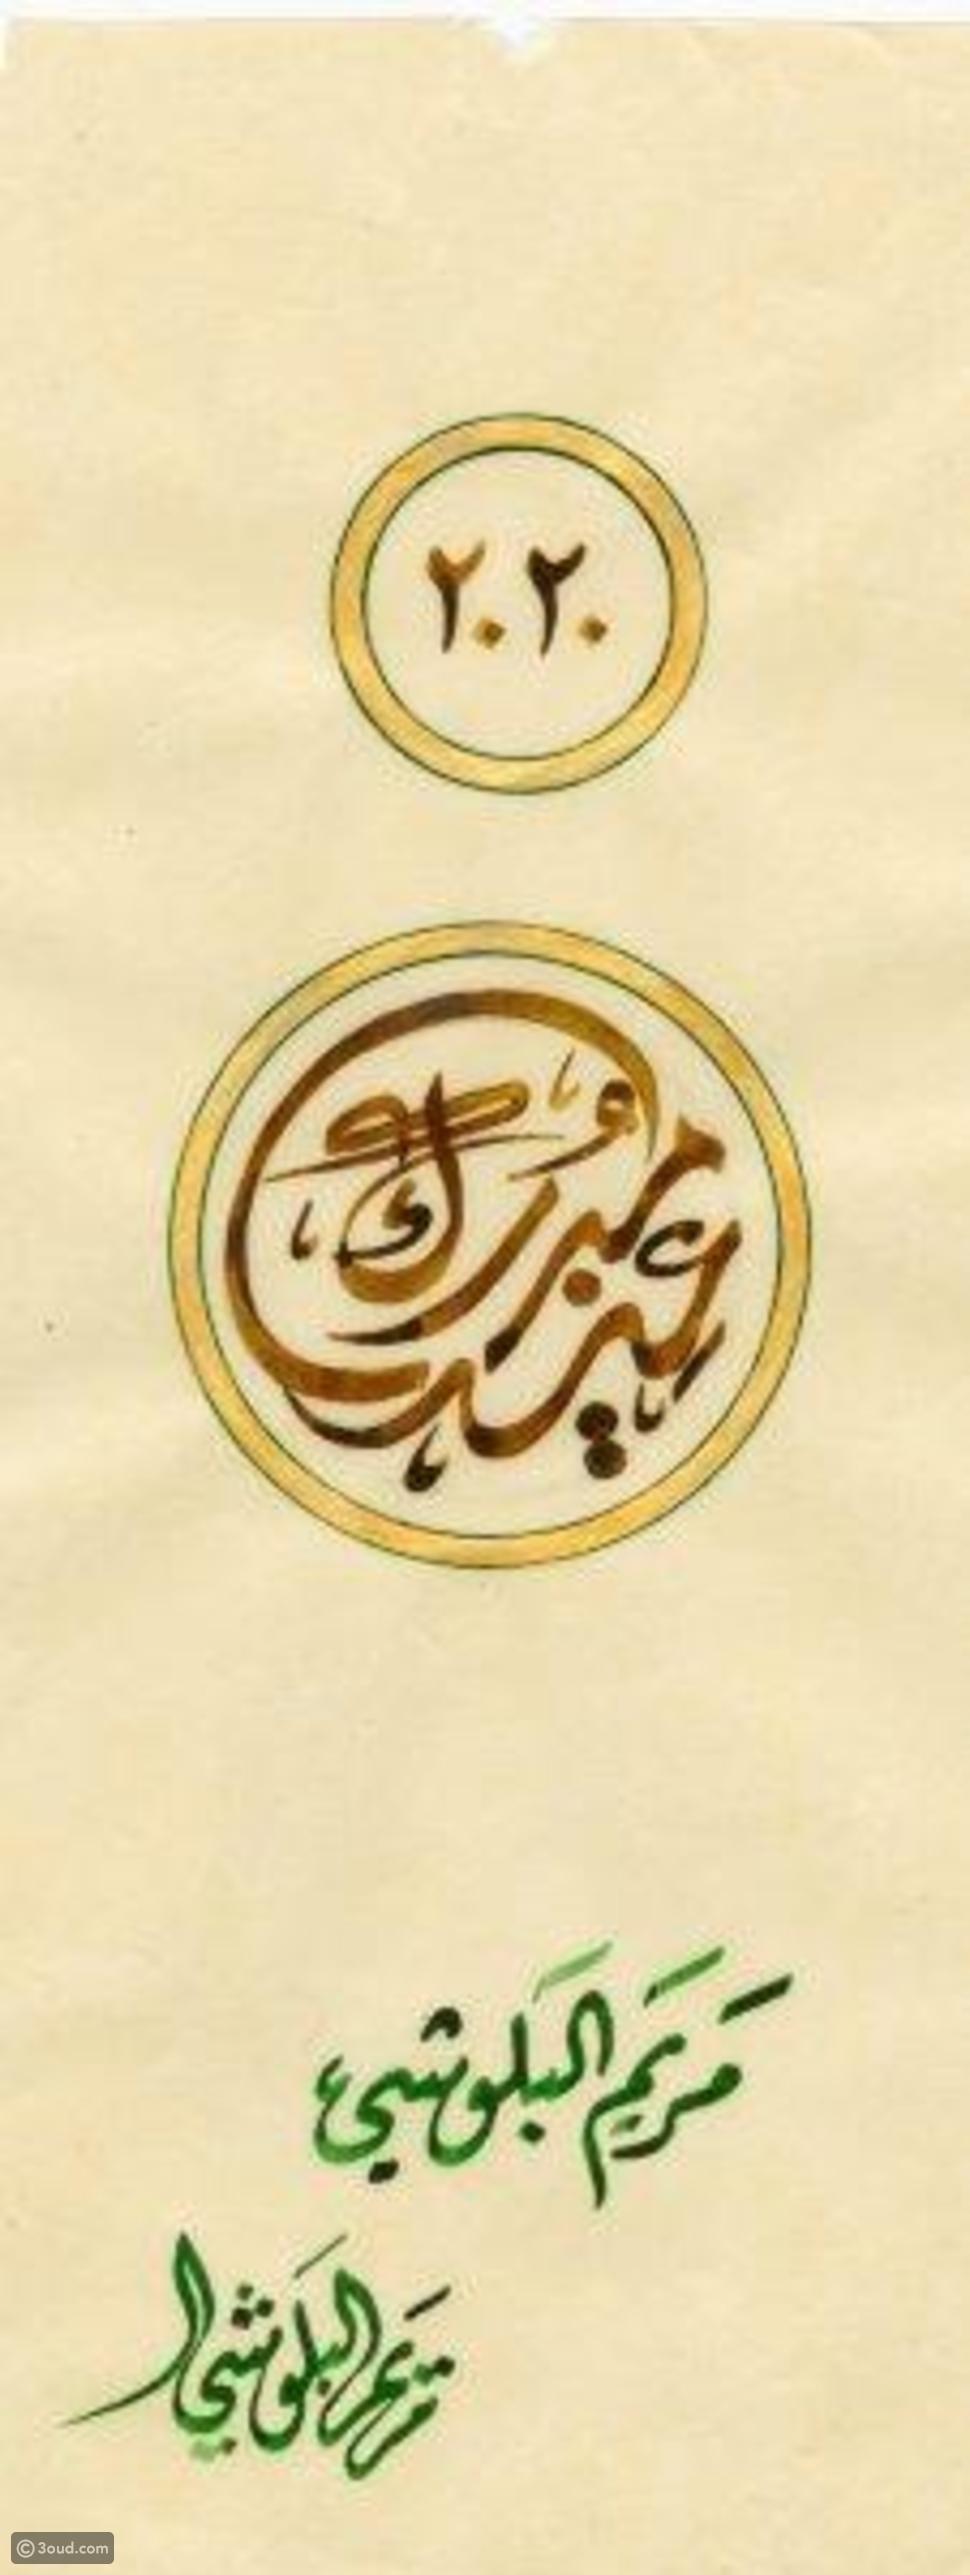 Van Cleef & Arpels تتعاون مع مريم البلوشي في تصميمات لرمضان والعيد